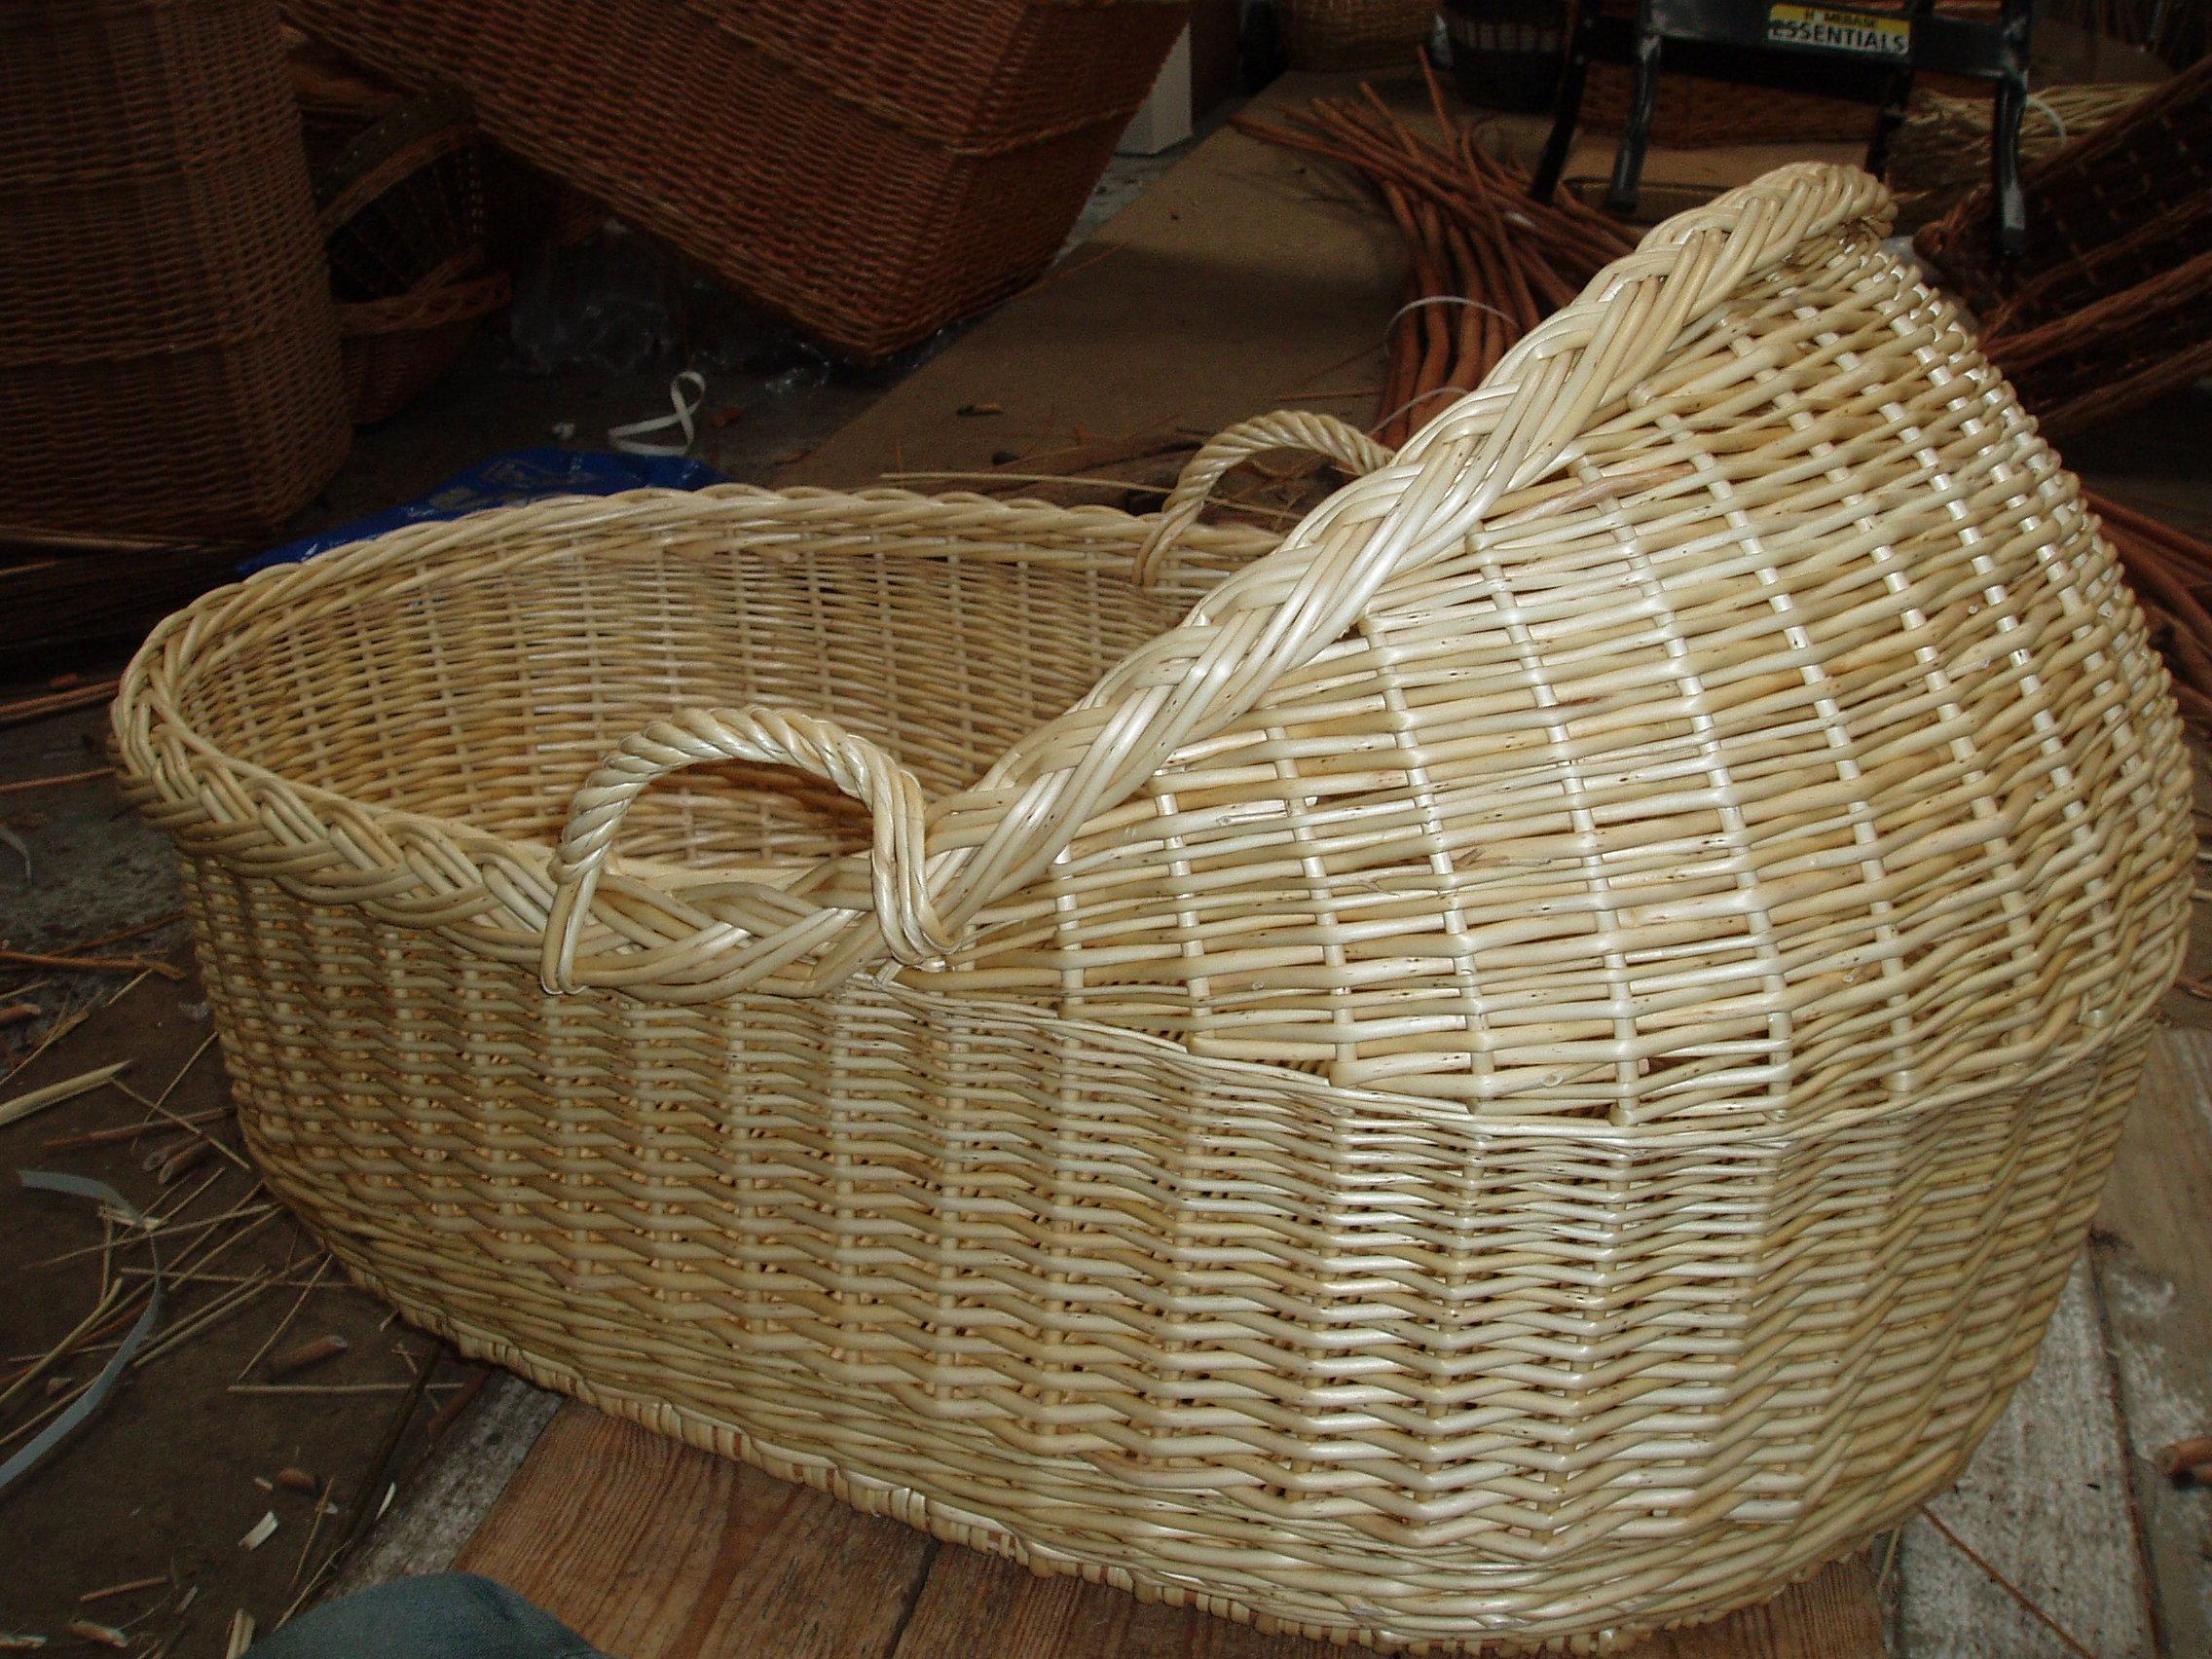 Moses Basket Wicker Baskets